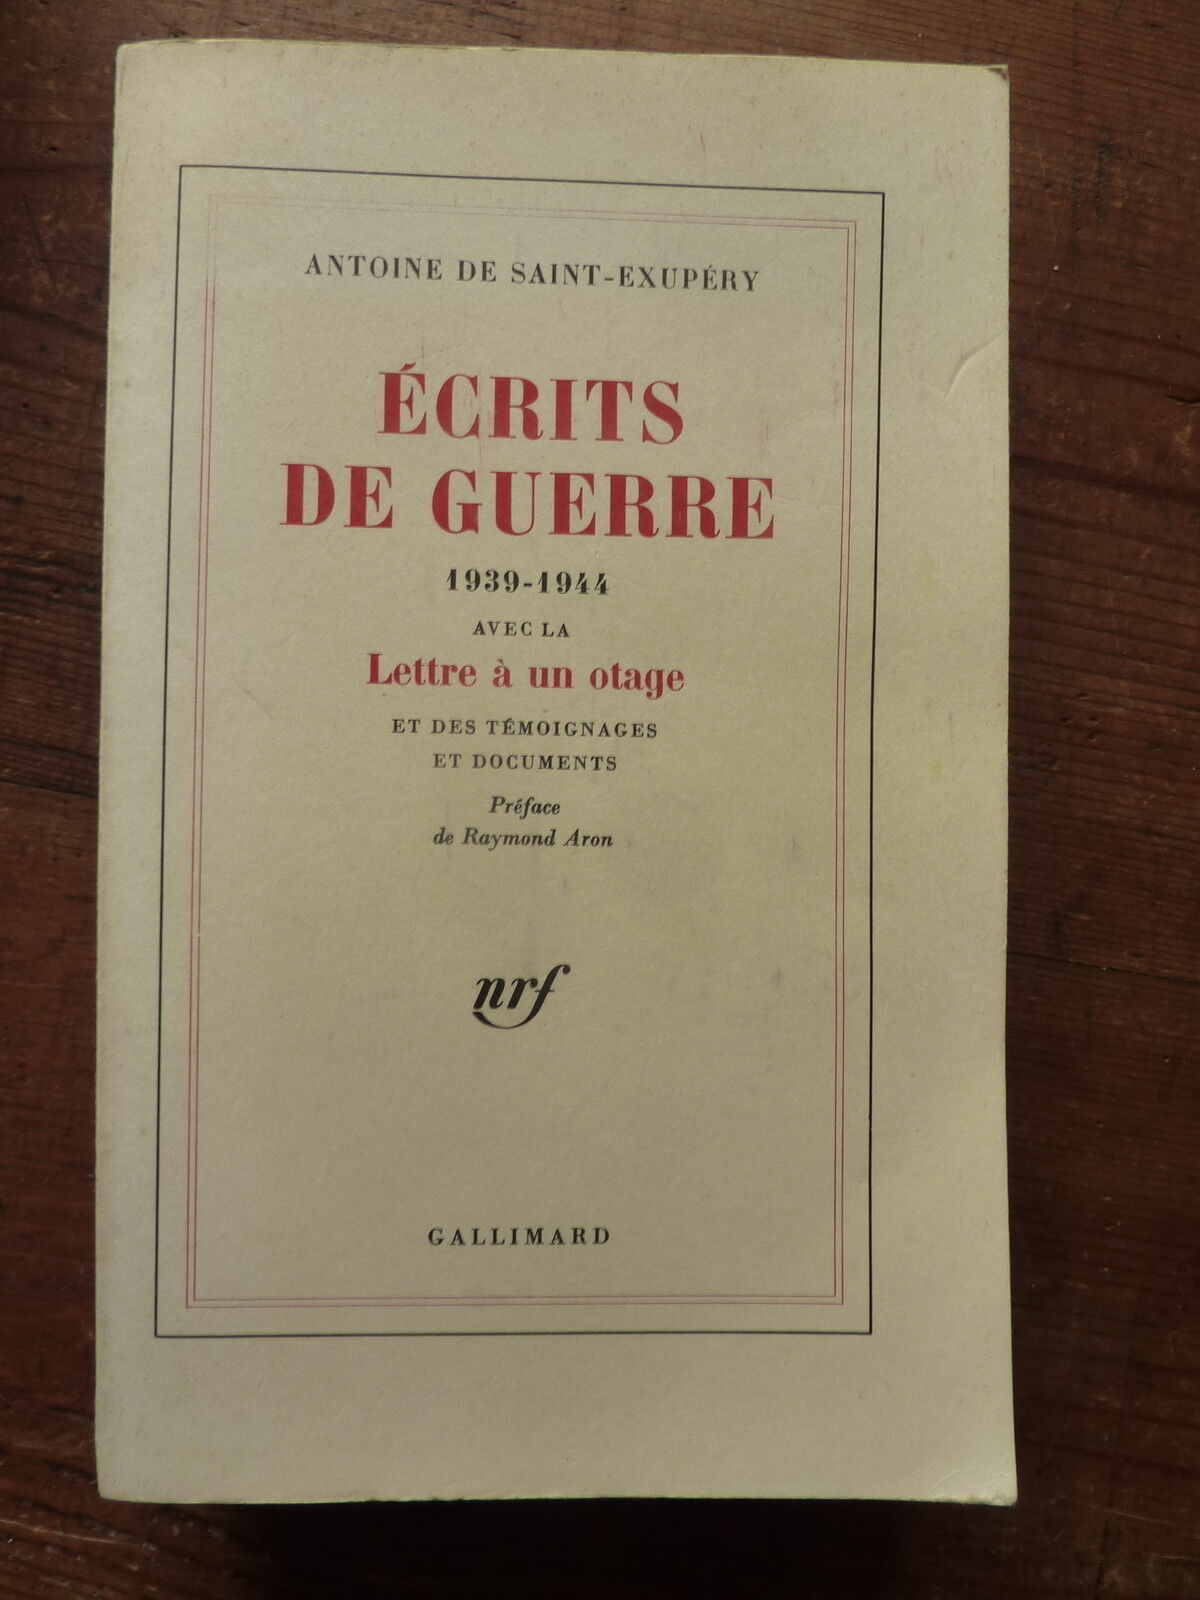 Ecrits de guerre - Gallimard - 11/10/1982